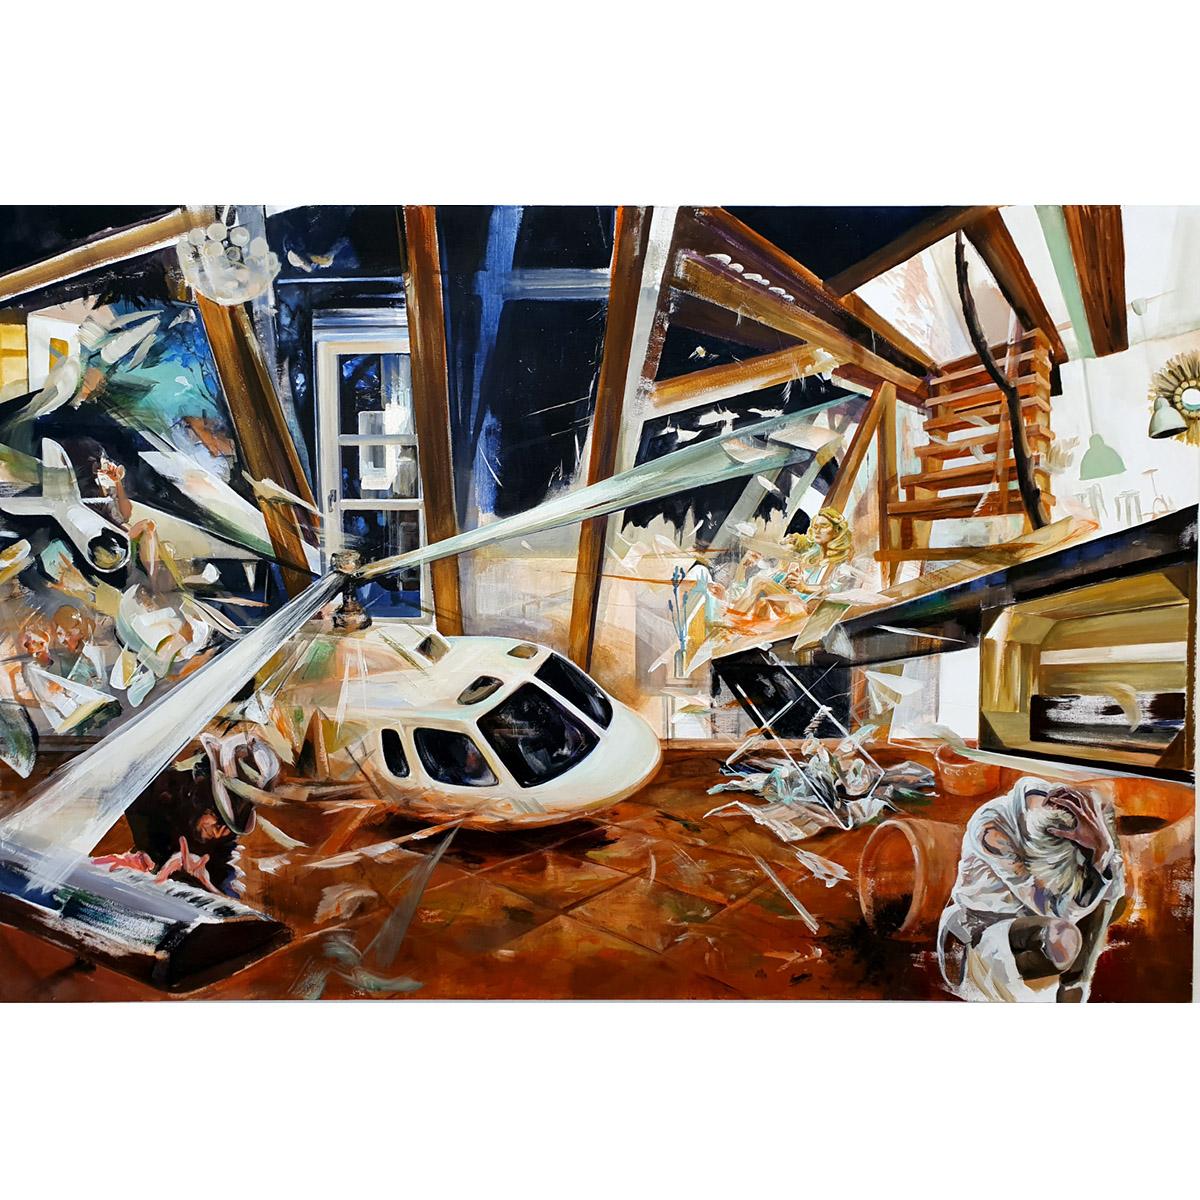 Nina Bußjäger: Kamaloka 3h, 2020, Acryl auf Leinwand, 100 x 150 cm